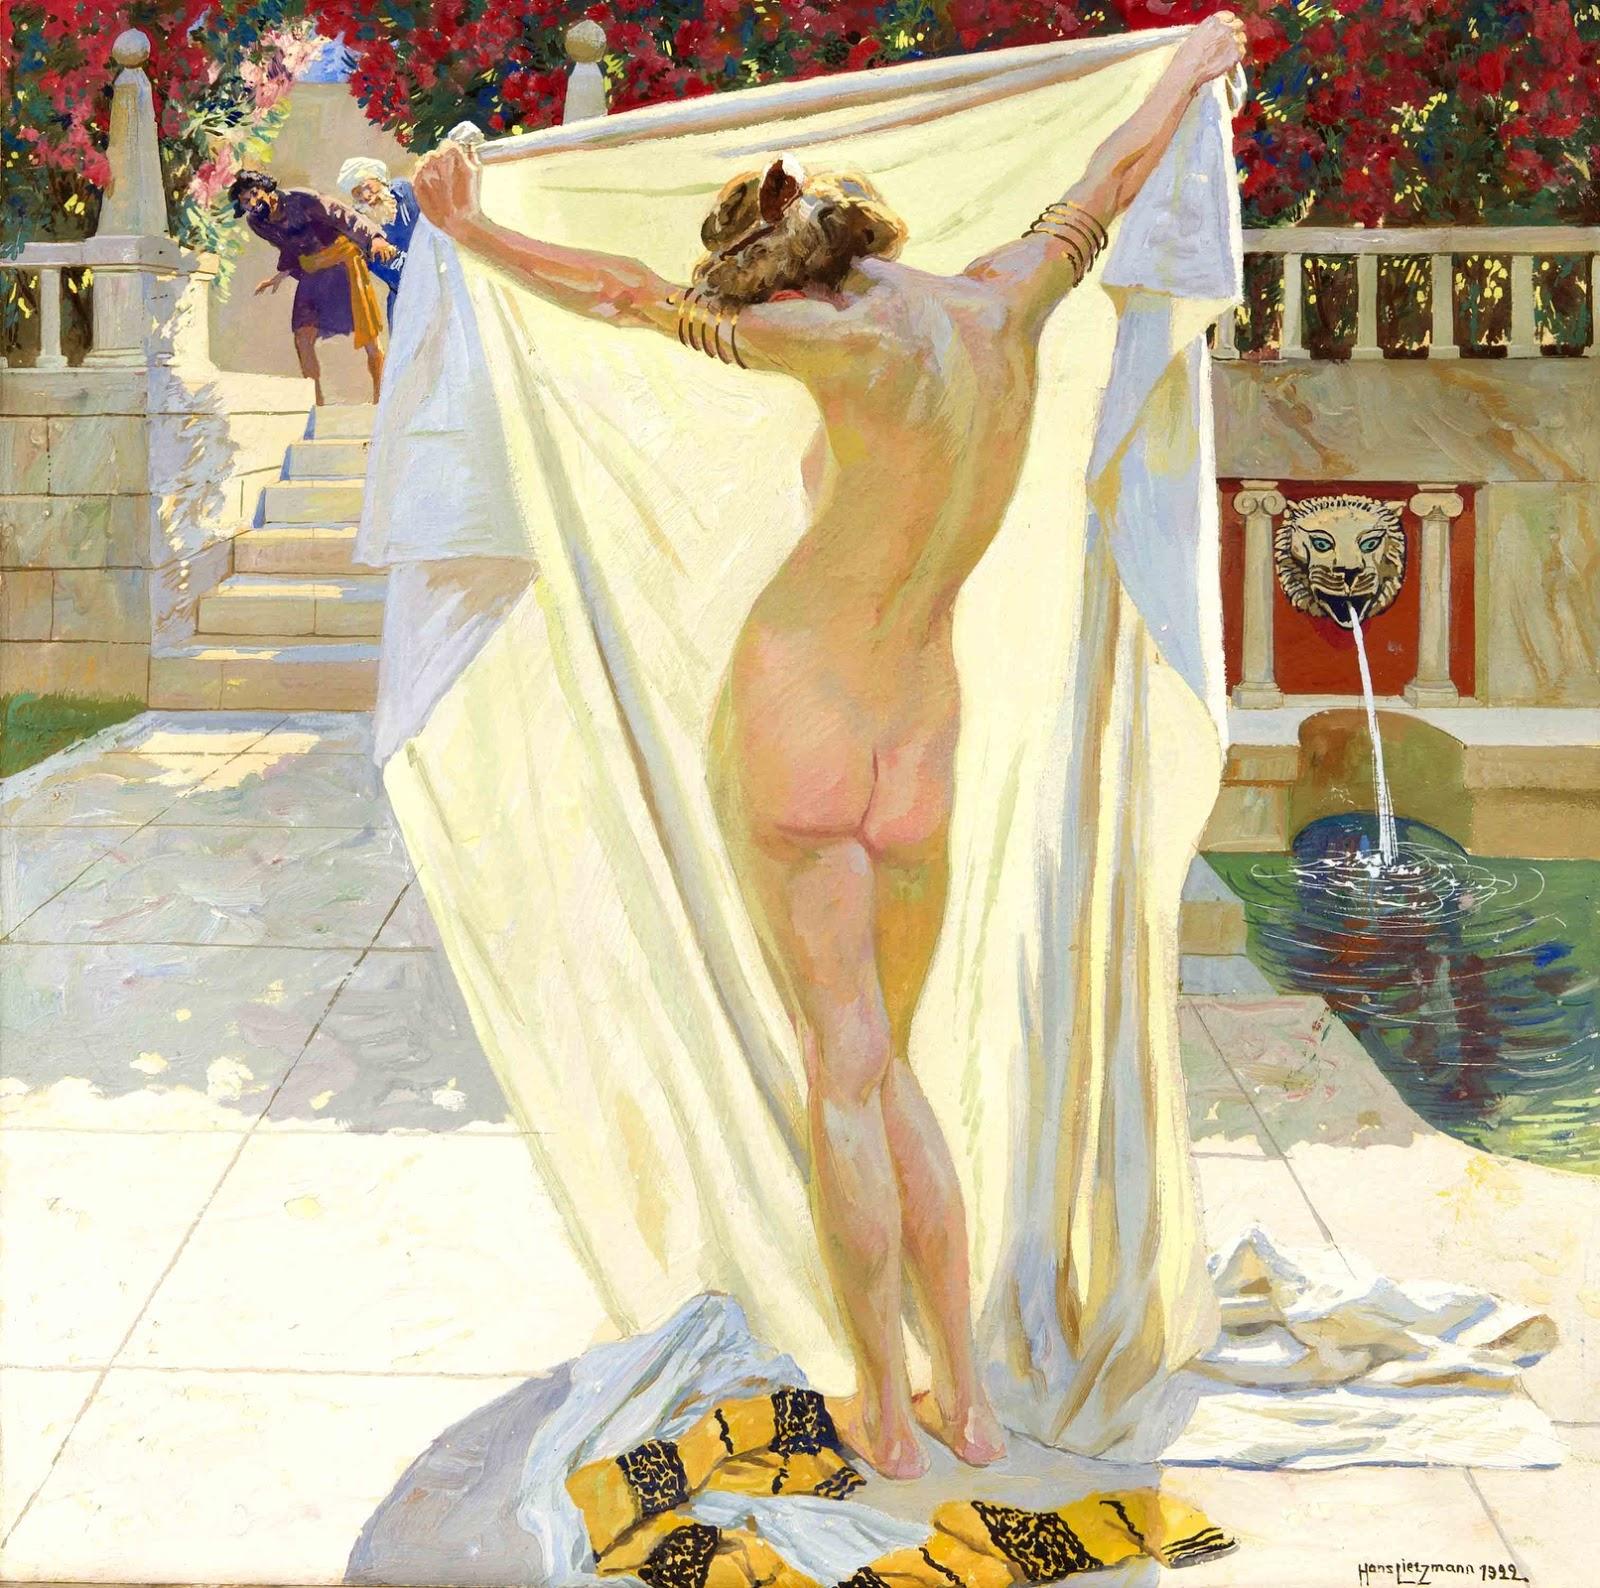 Hans Lietzmann, 1872-1955 (Германия)_Сусанна в купальне (Susanna in the bath)_1923_47 х 48_картон, гуашь_Частное собрание.jpg